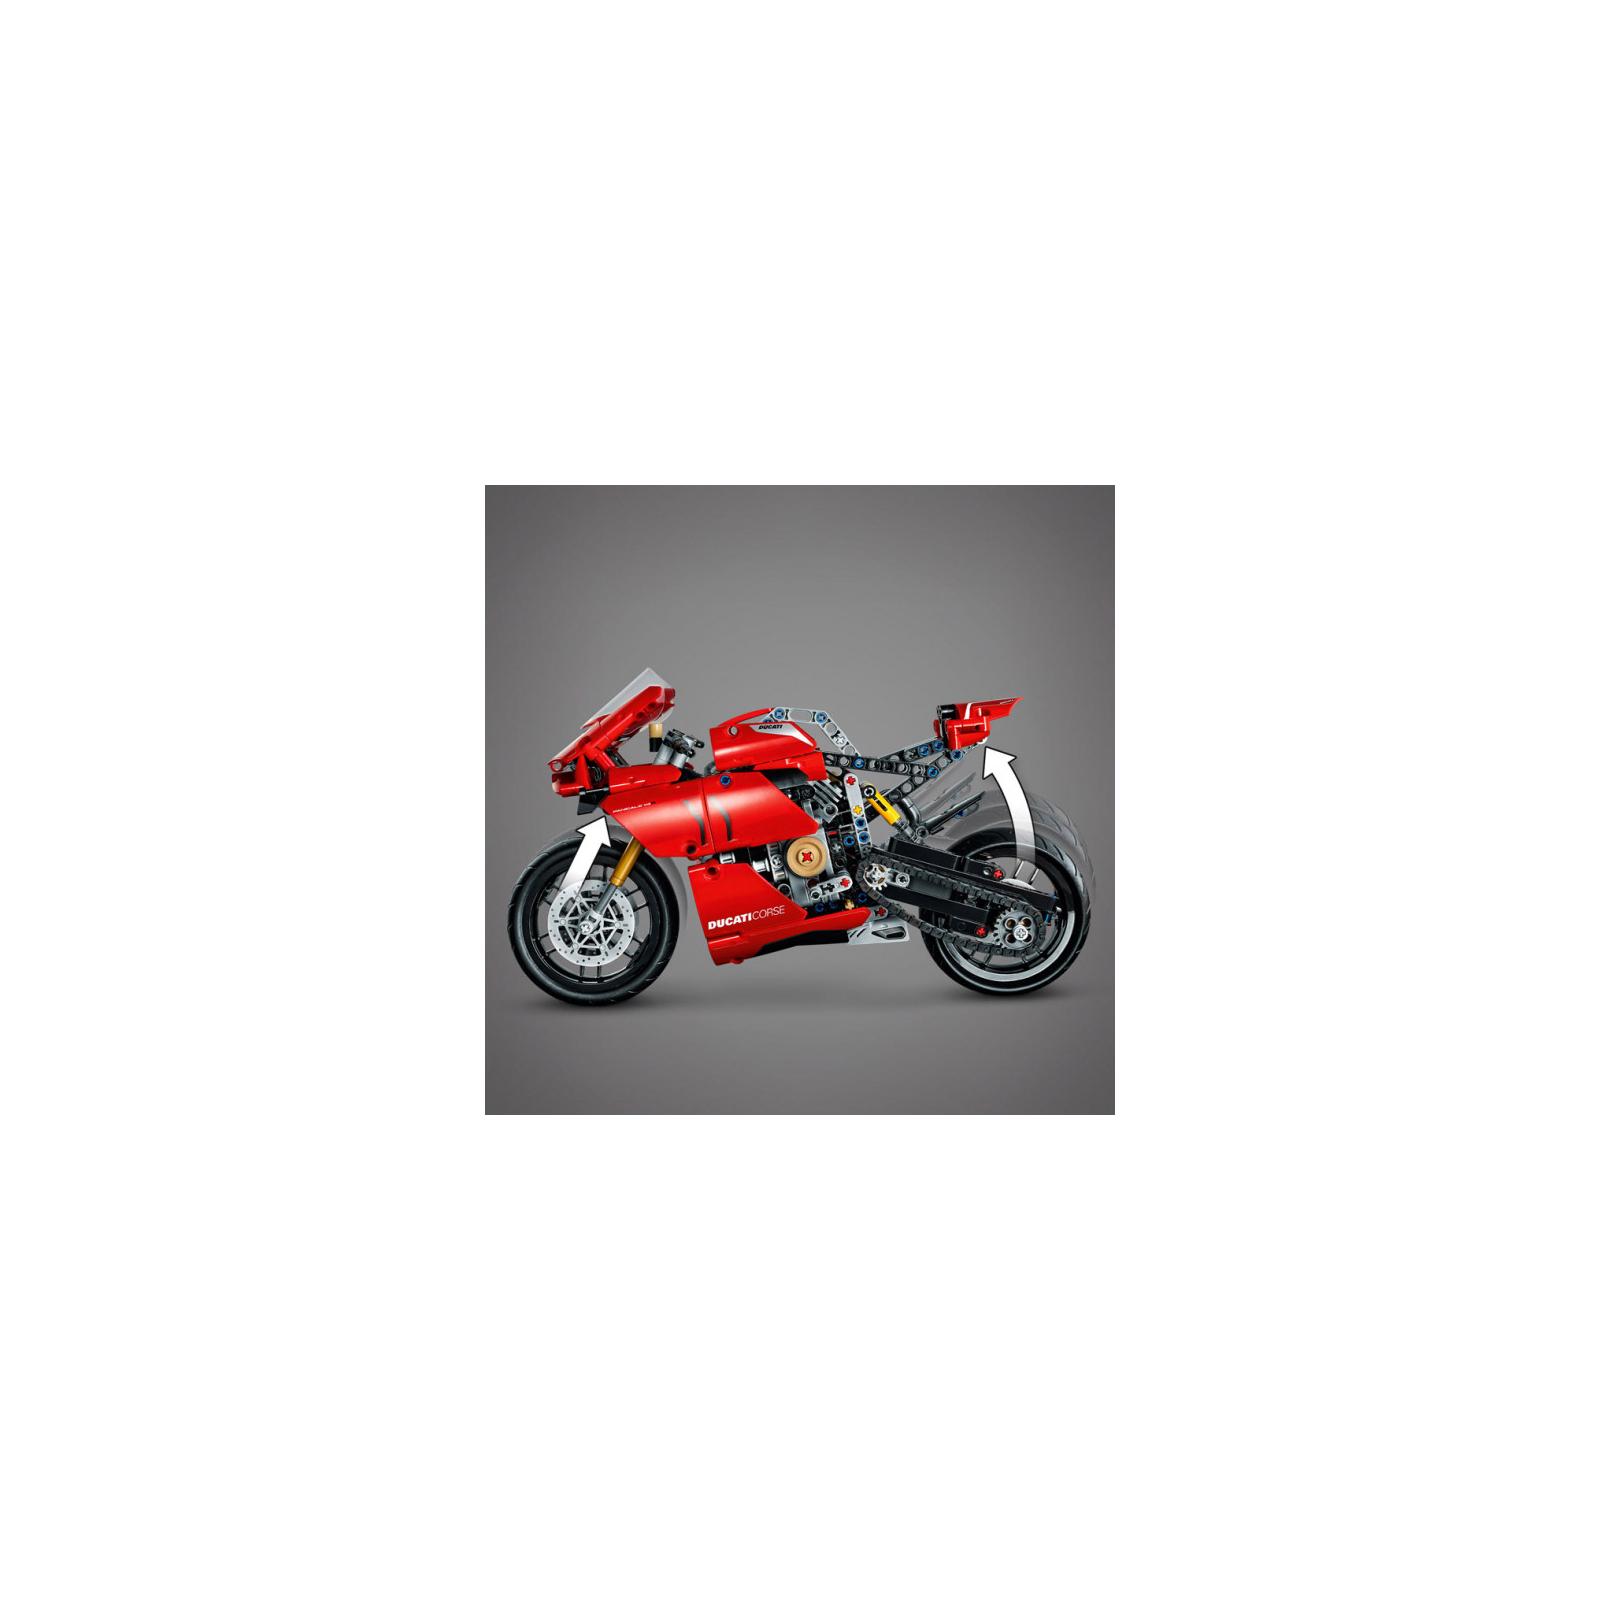 Конструктор LEGO Technic Ducati Panigale V4 R 0 646 детали (42107) изображение 7